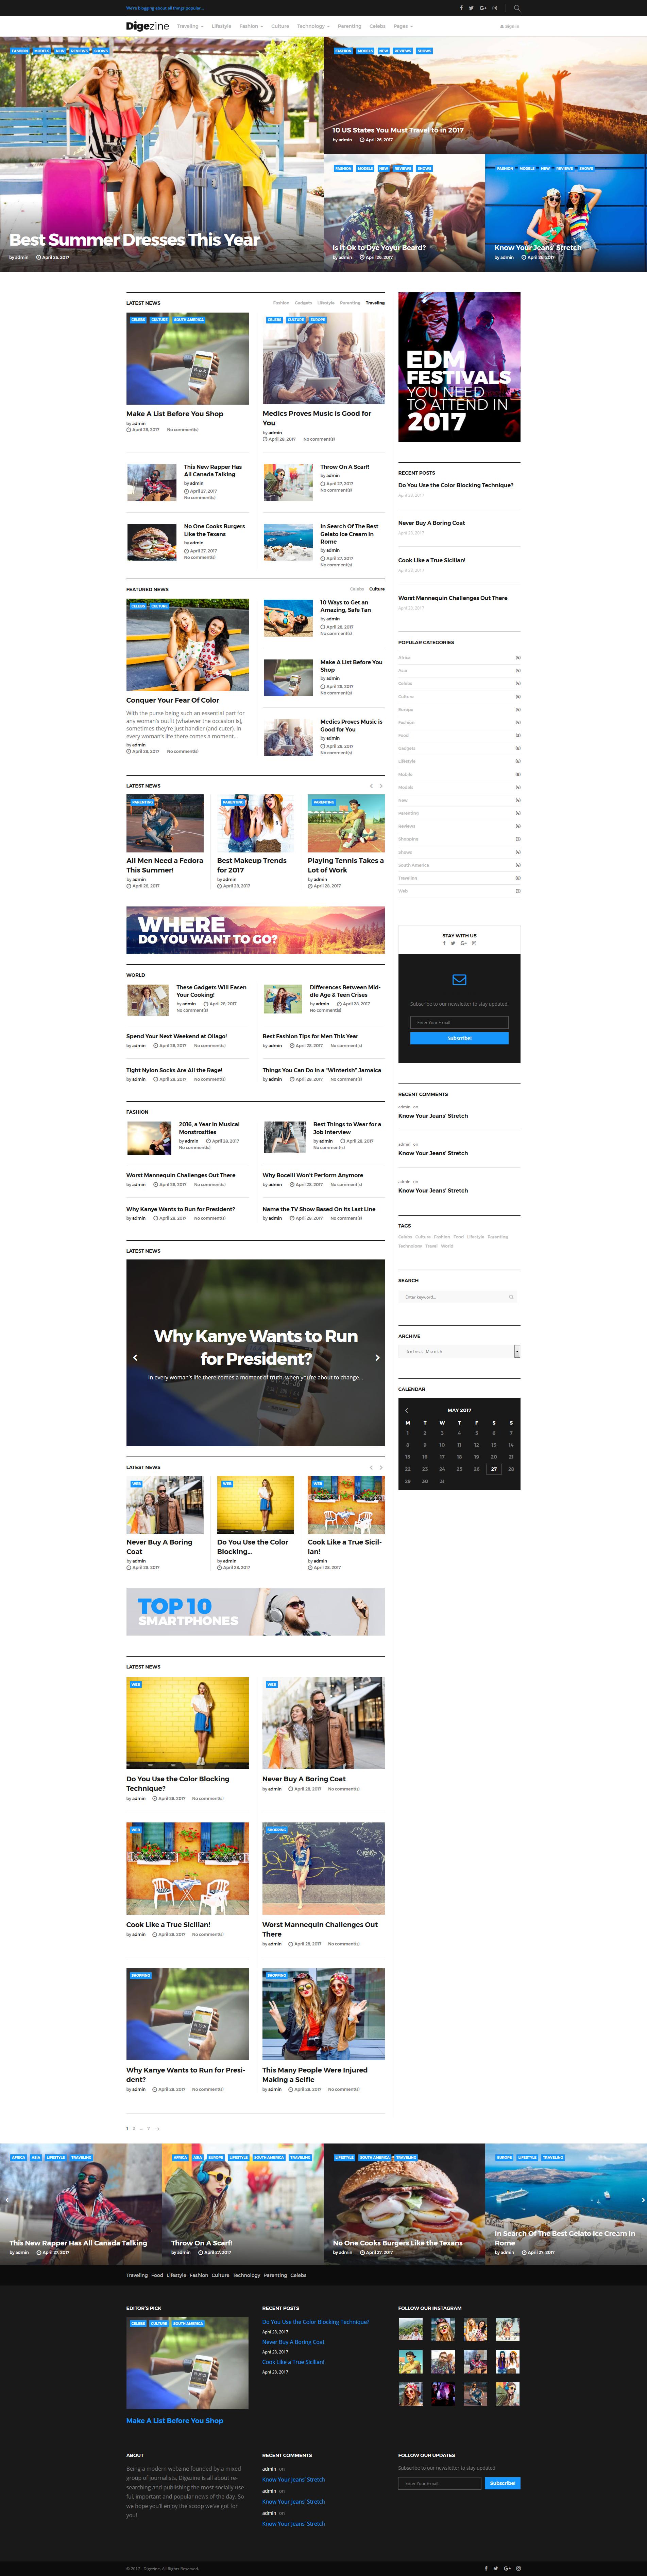 """Digezine - News Magazine"" 响应式WordPress模板 #63850"